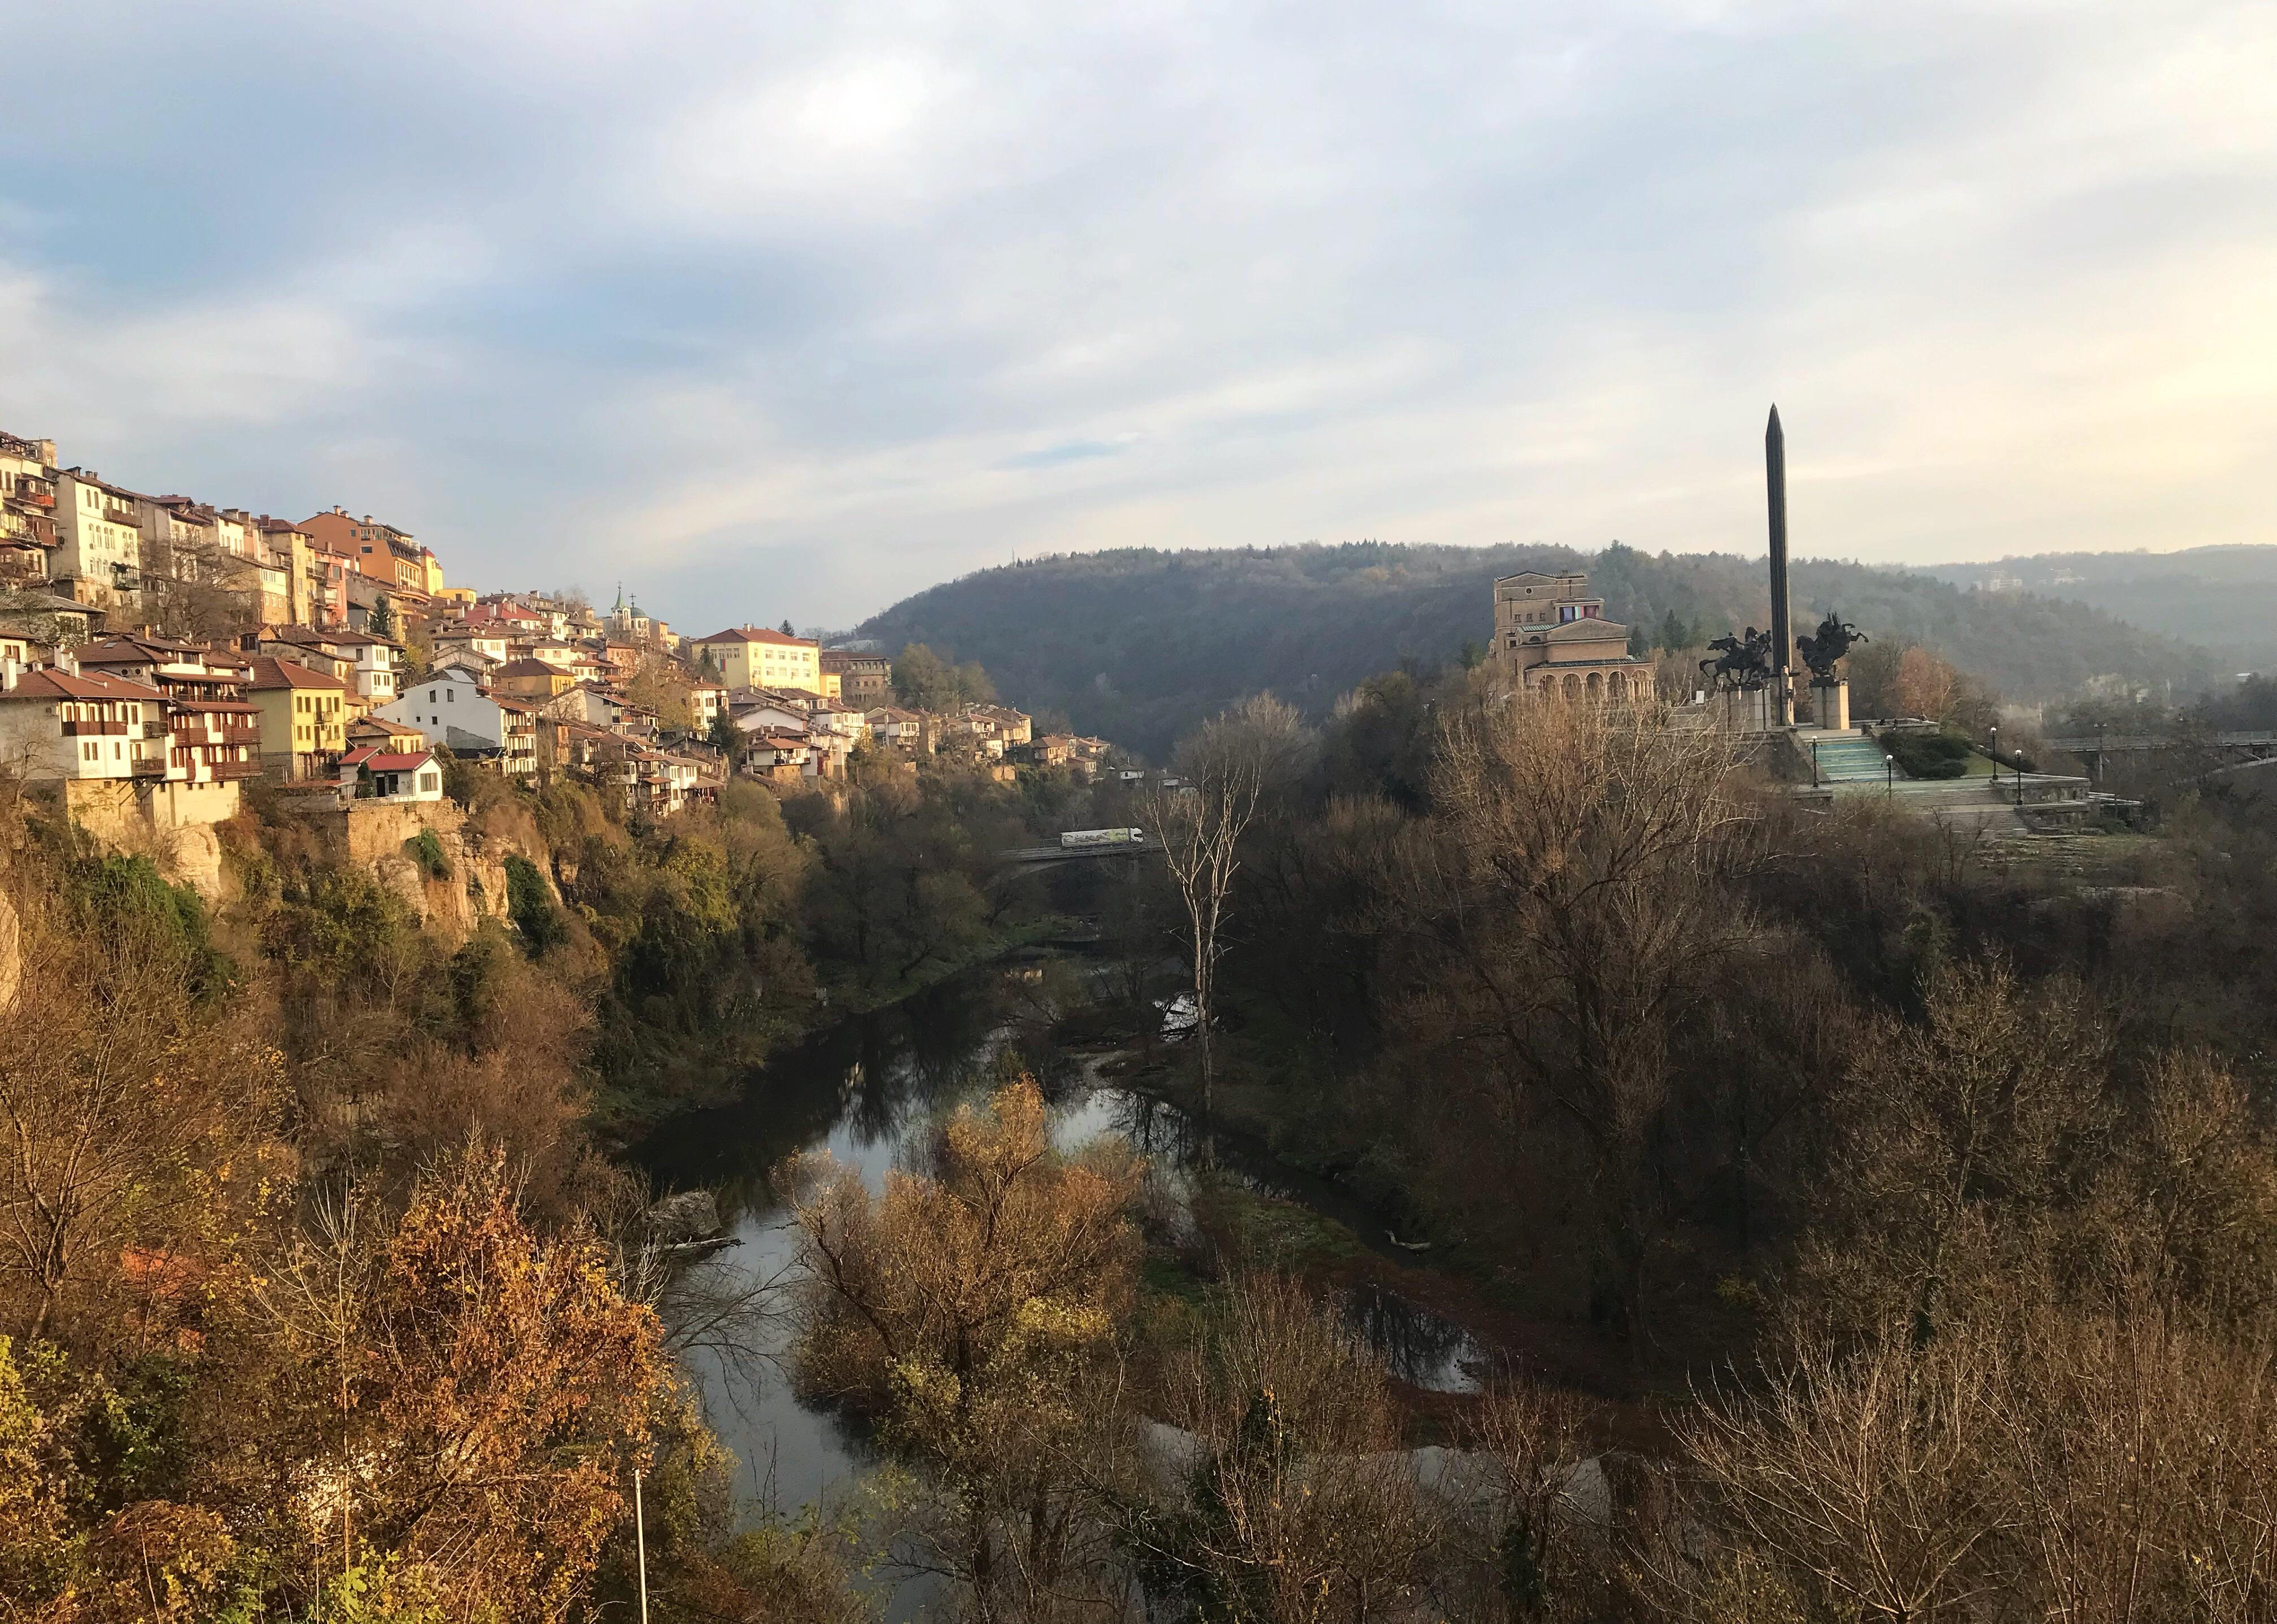 Traveling alone in Bulgaria